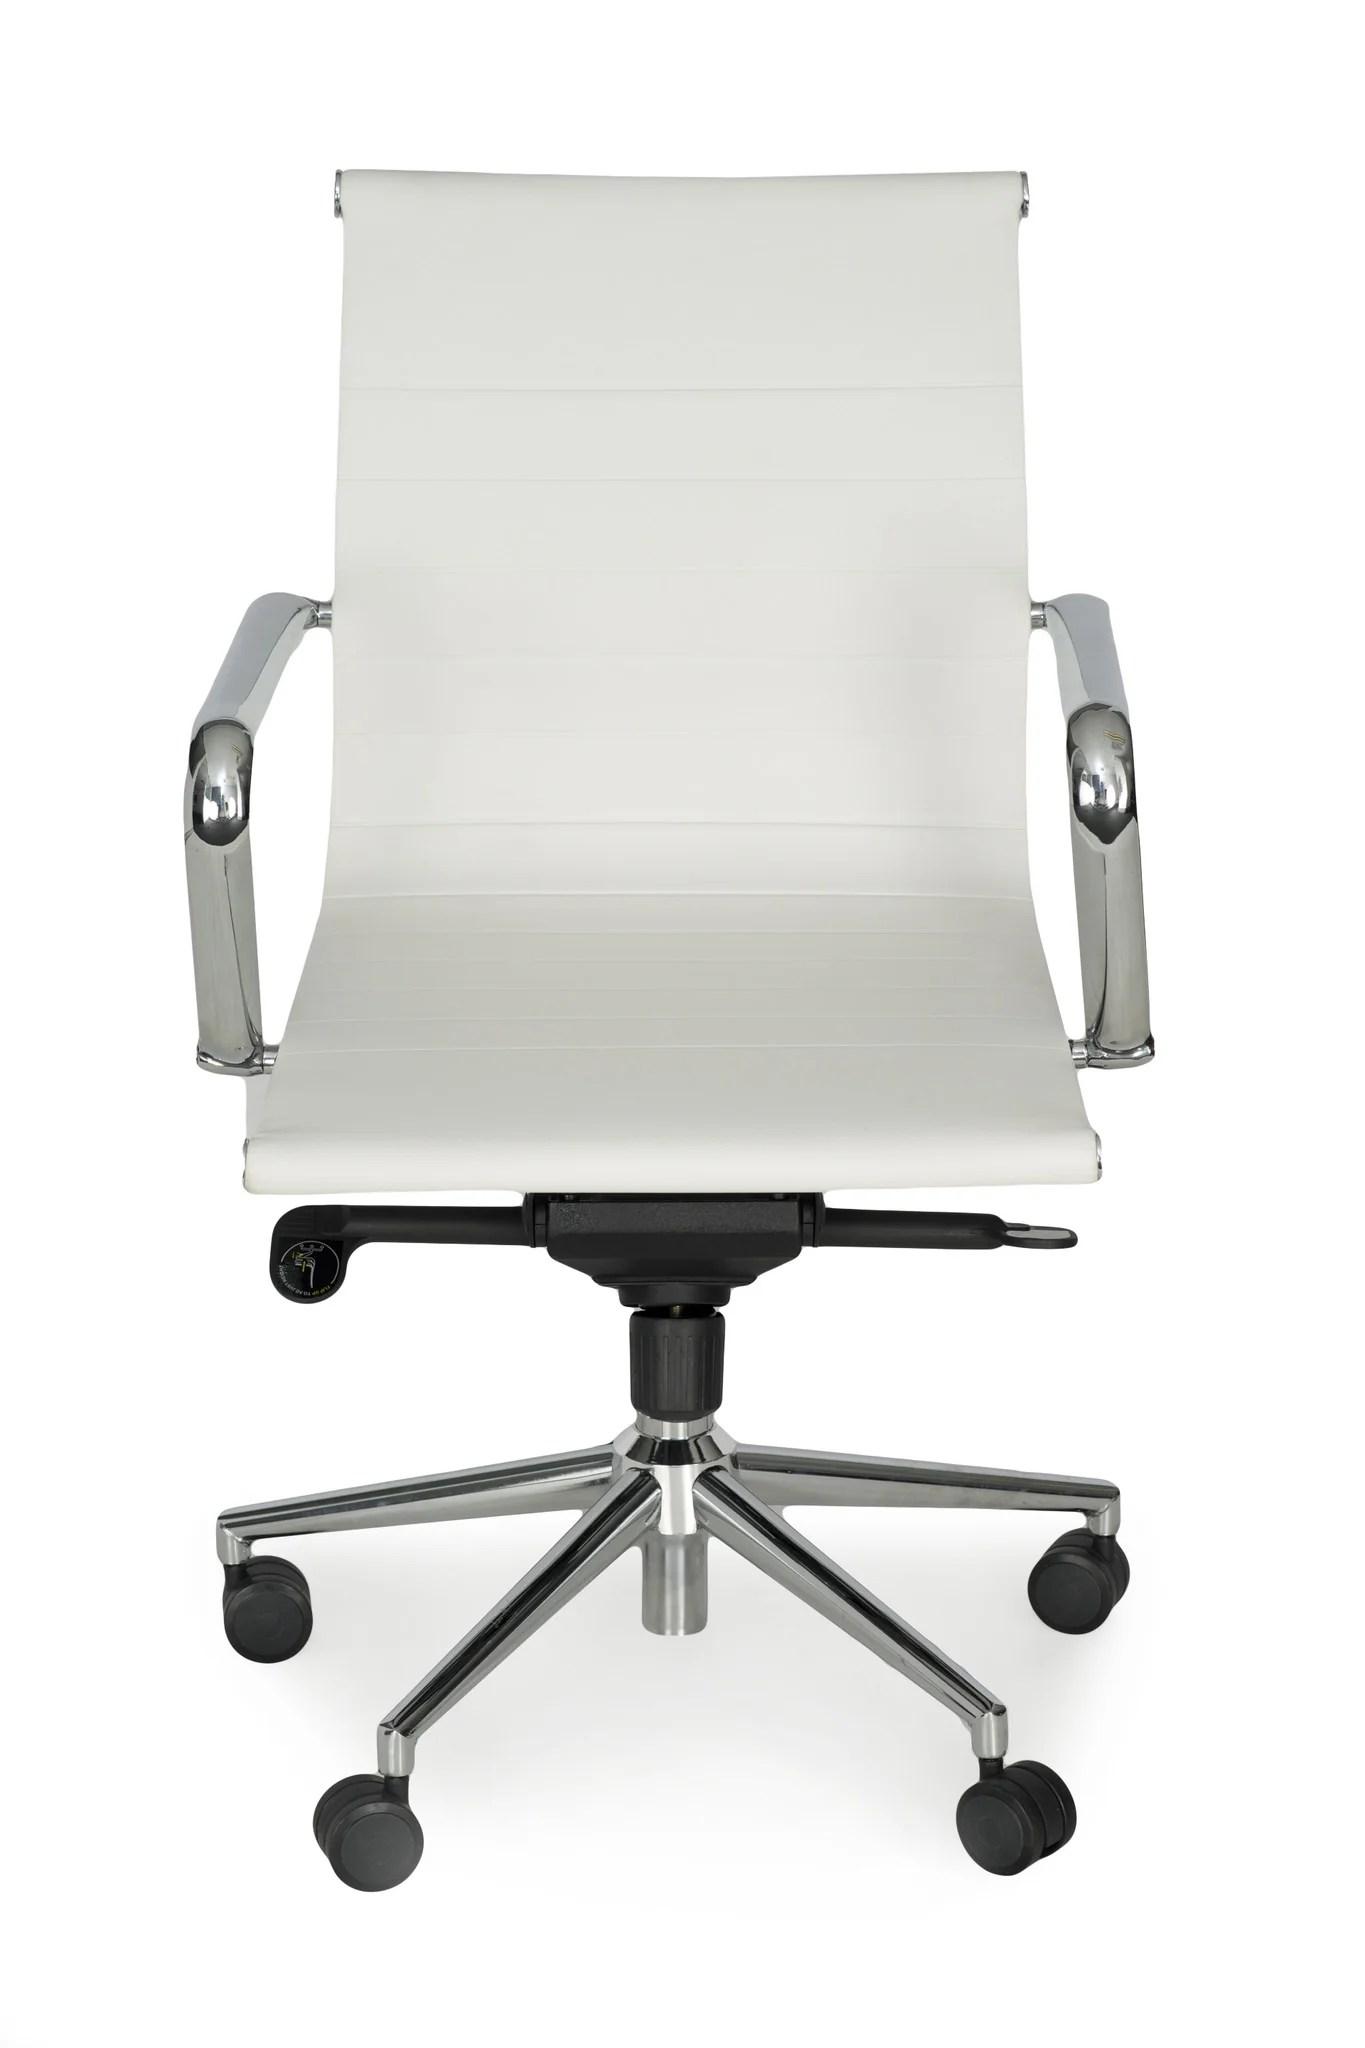 ergonomic chair trial plastic lawn chairs astoria medium back